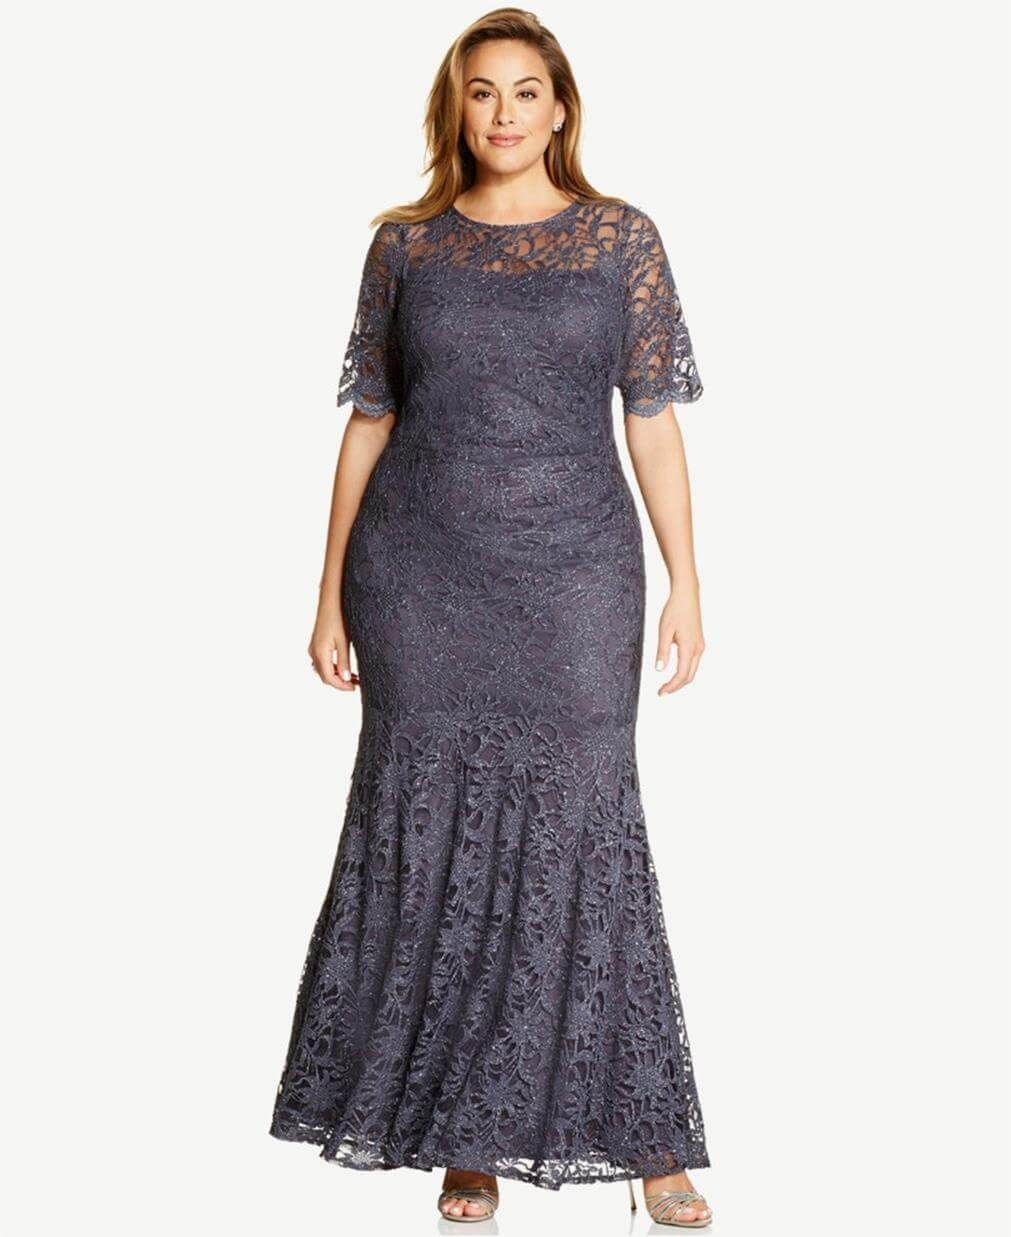 c6dec3fff60 30+ Beautiful Macys Dresses For Wedding Guests Ideas